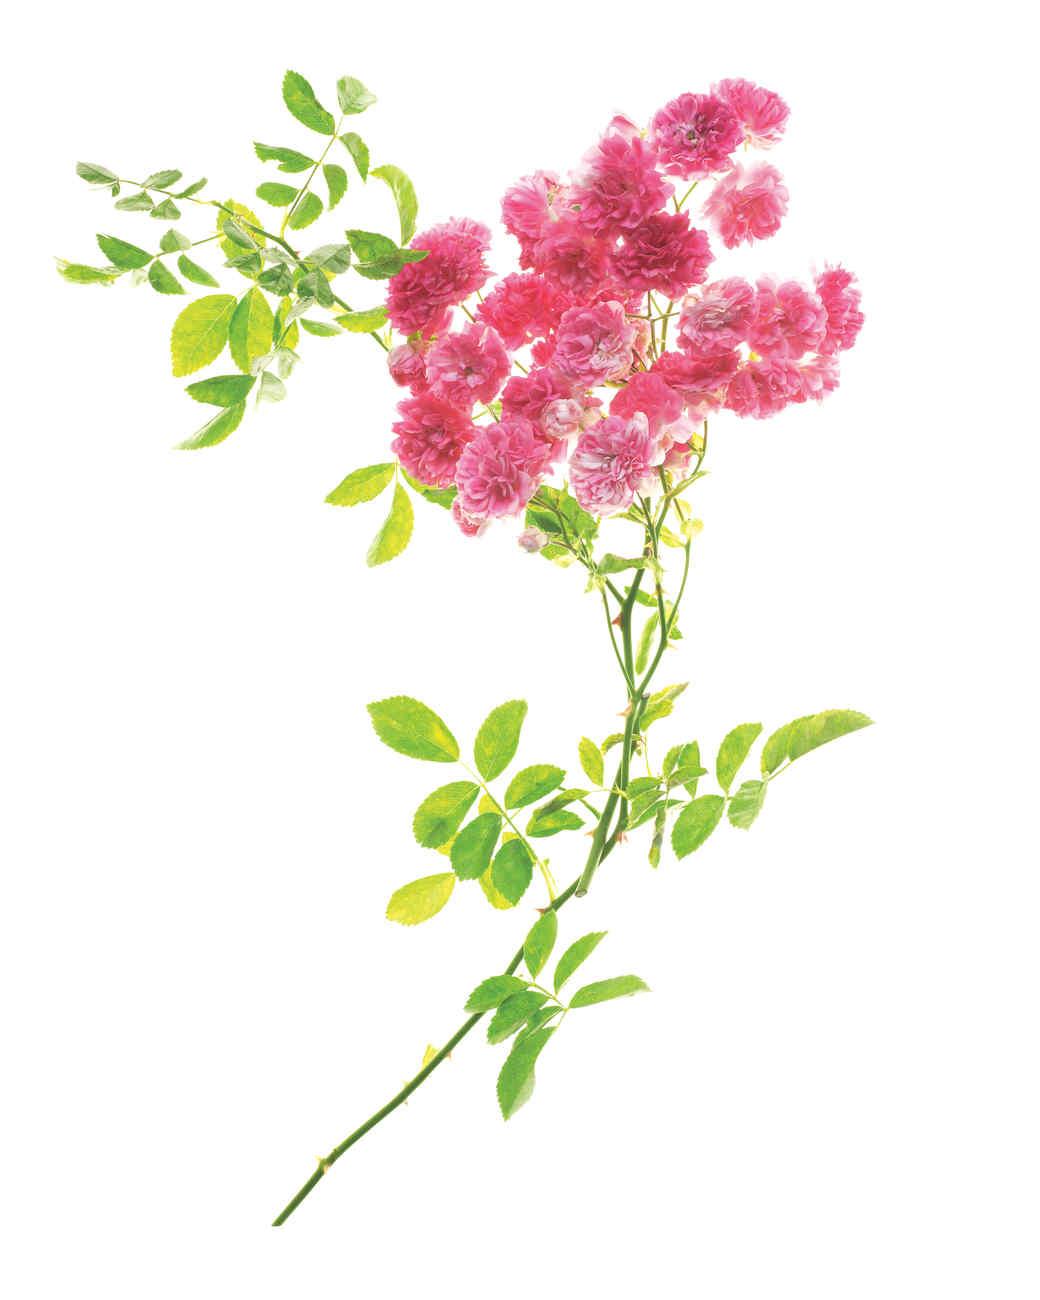 excelsa-rose-ms108508.jpg